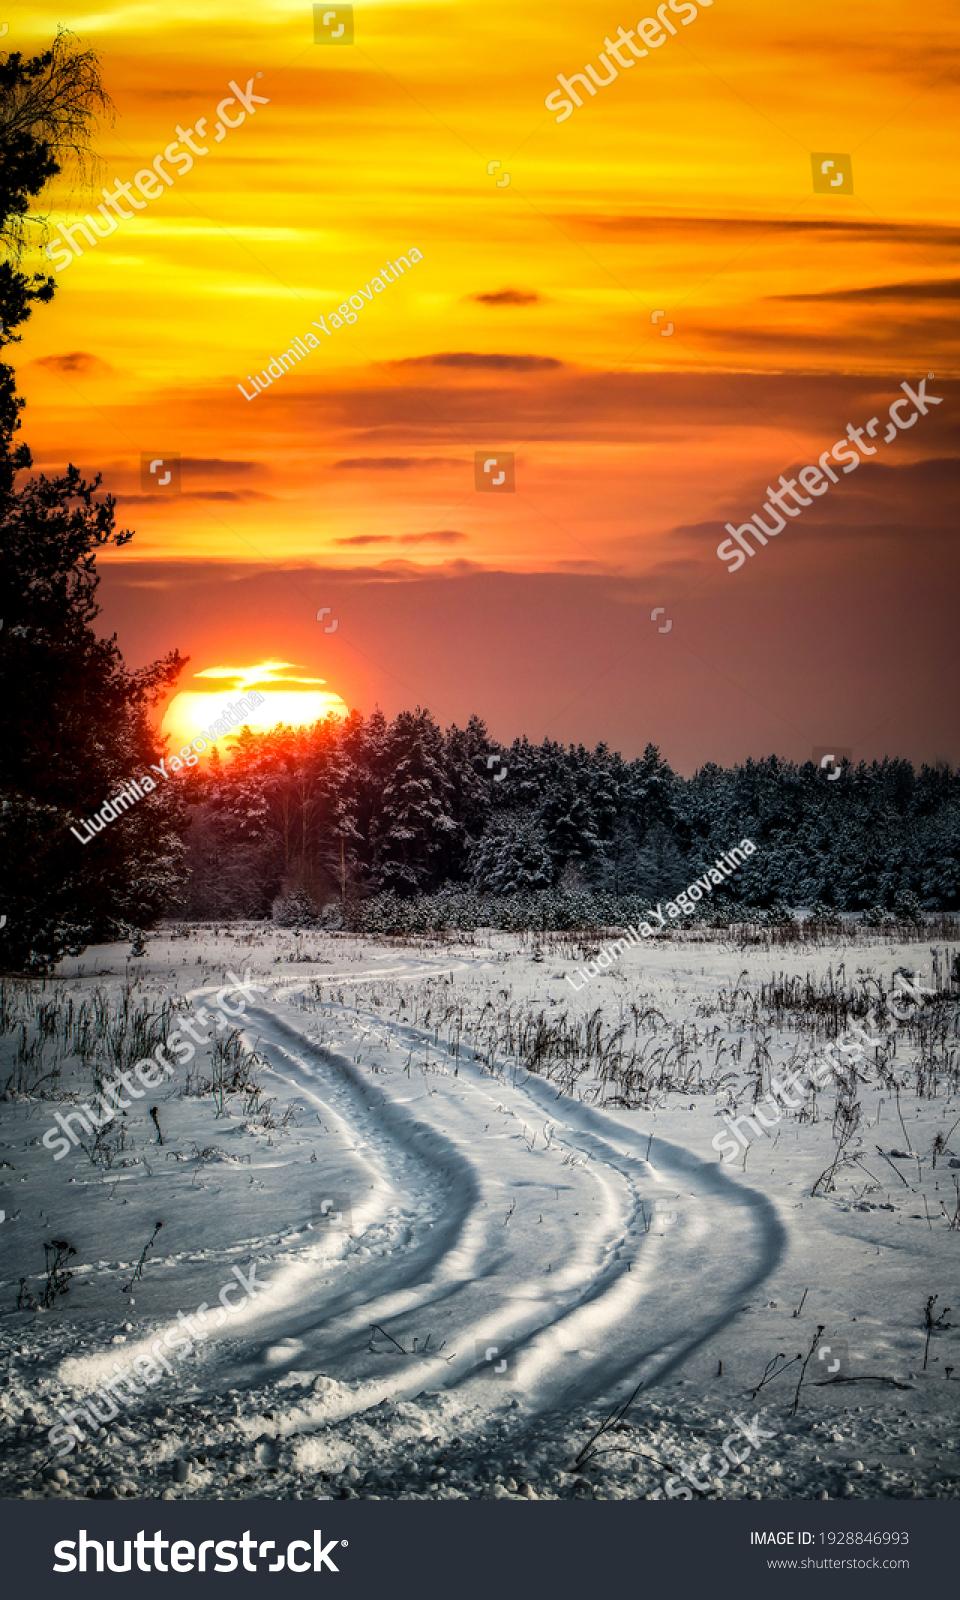 Sunset winter snow outdoors vertical scene #1928846993